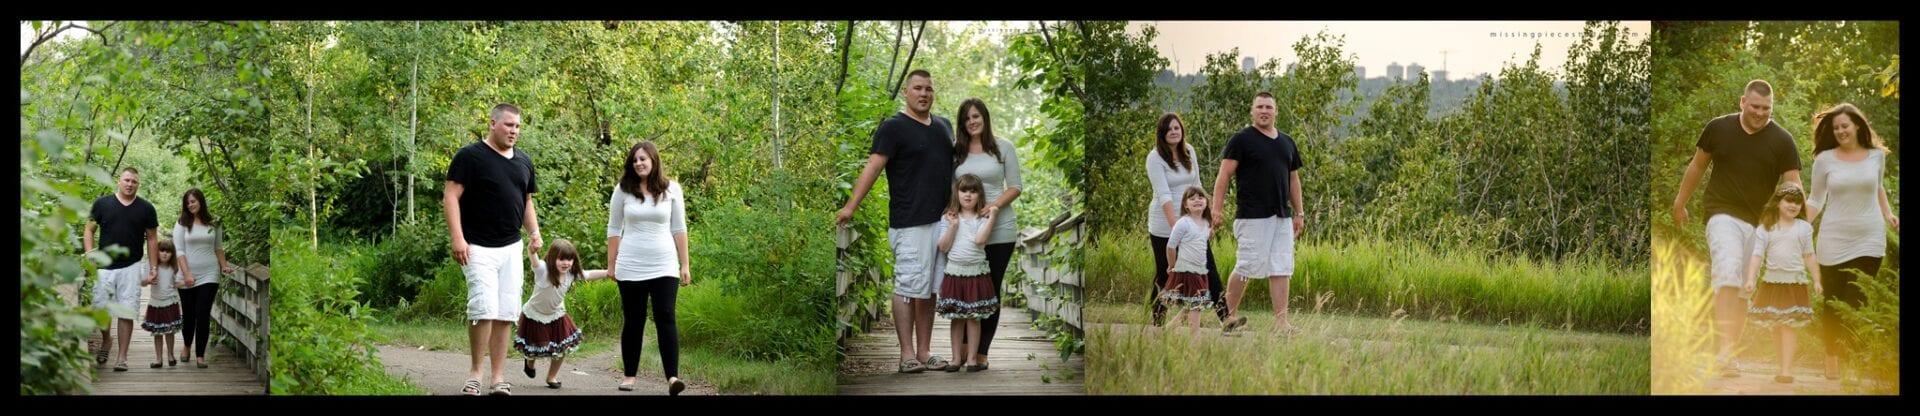 Edmonton Family Portrait Photography Candid-collage011